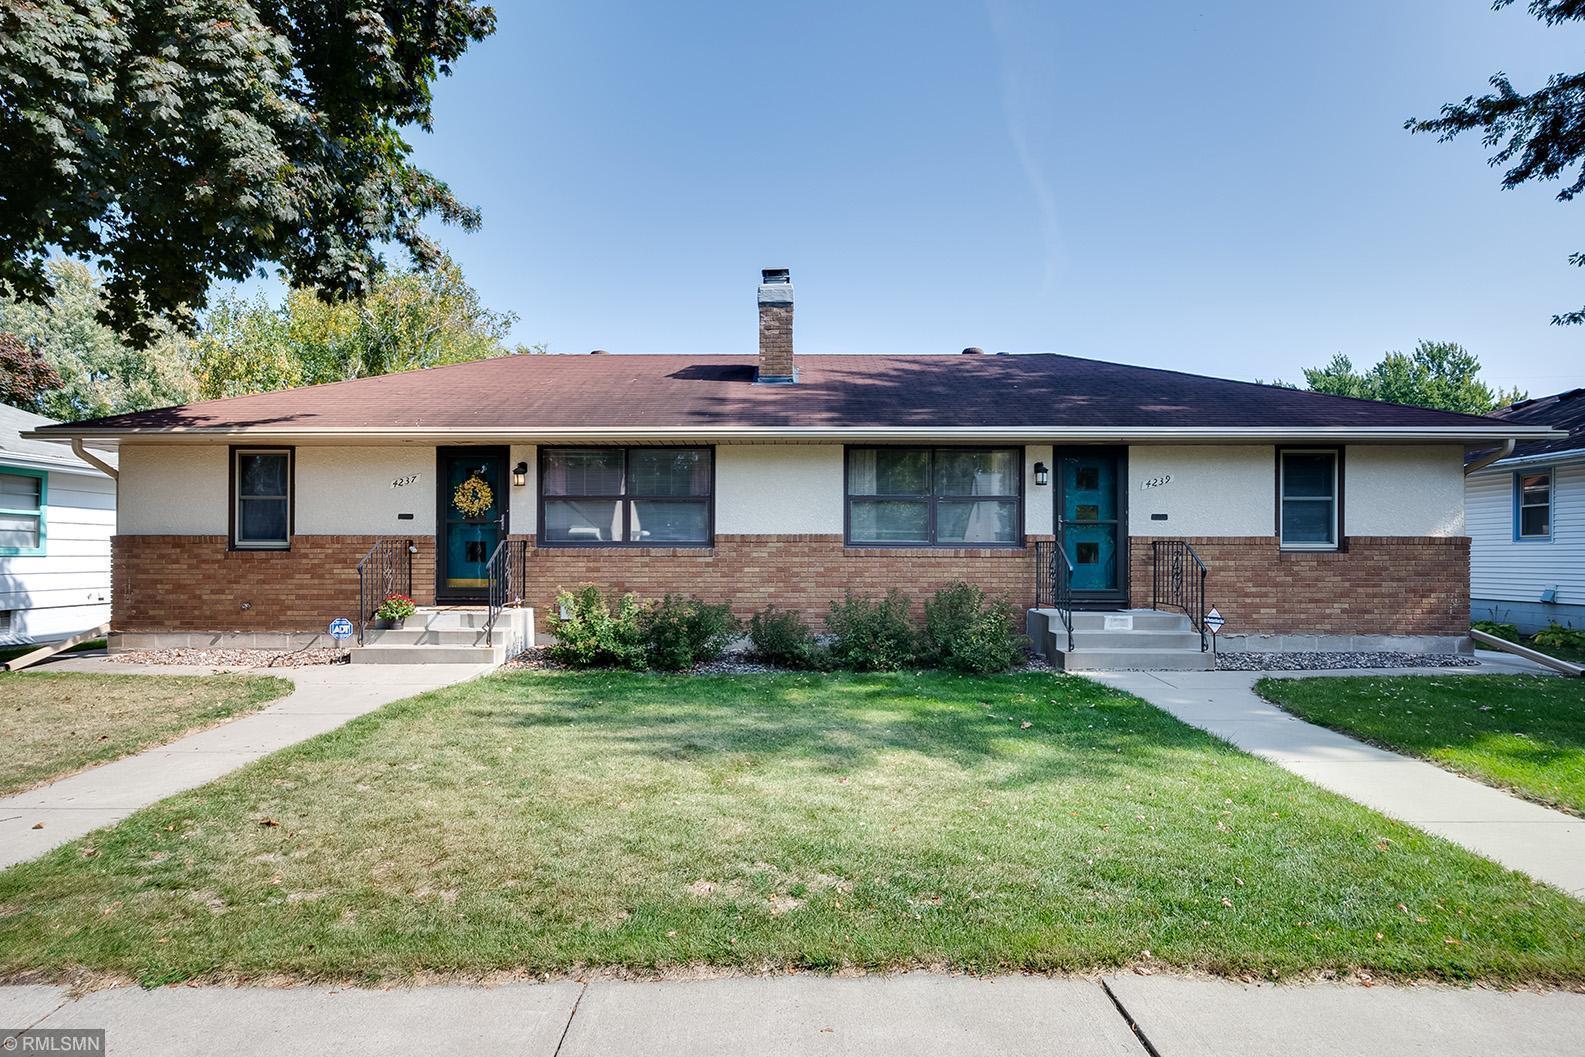 4237 16th Avenue S Property Photo - Minneapolis, MN real estate listing